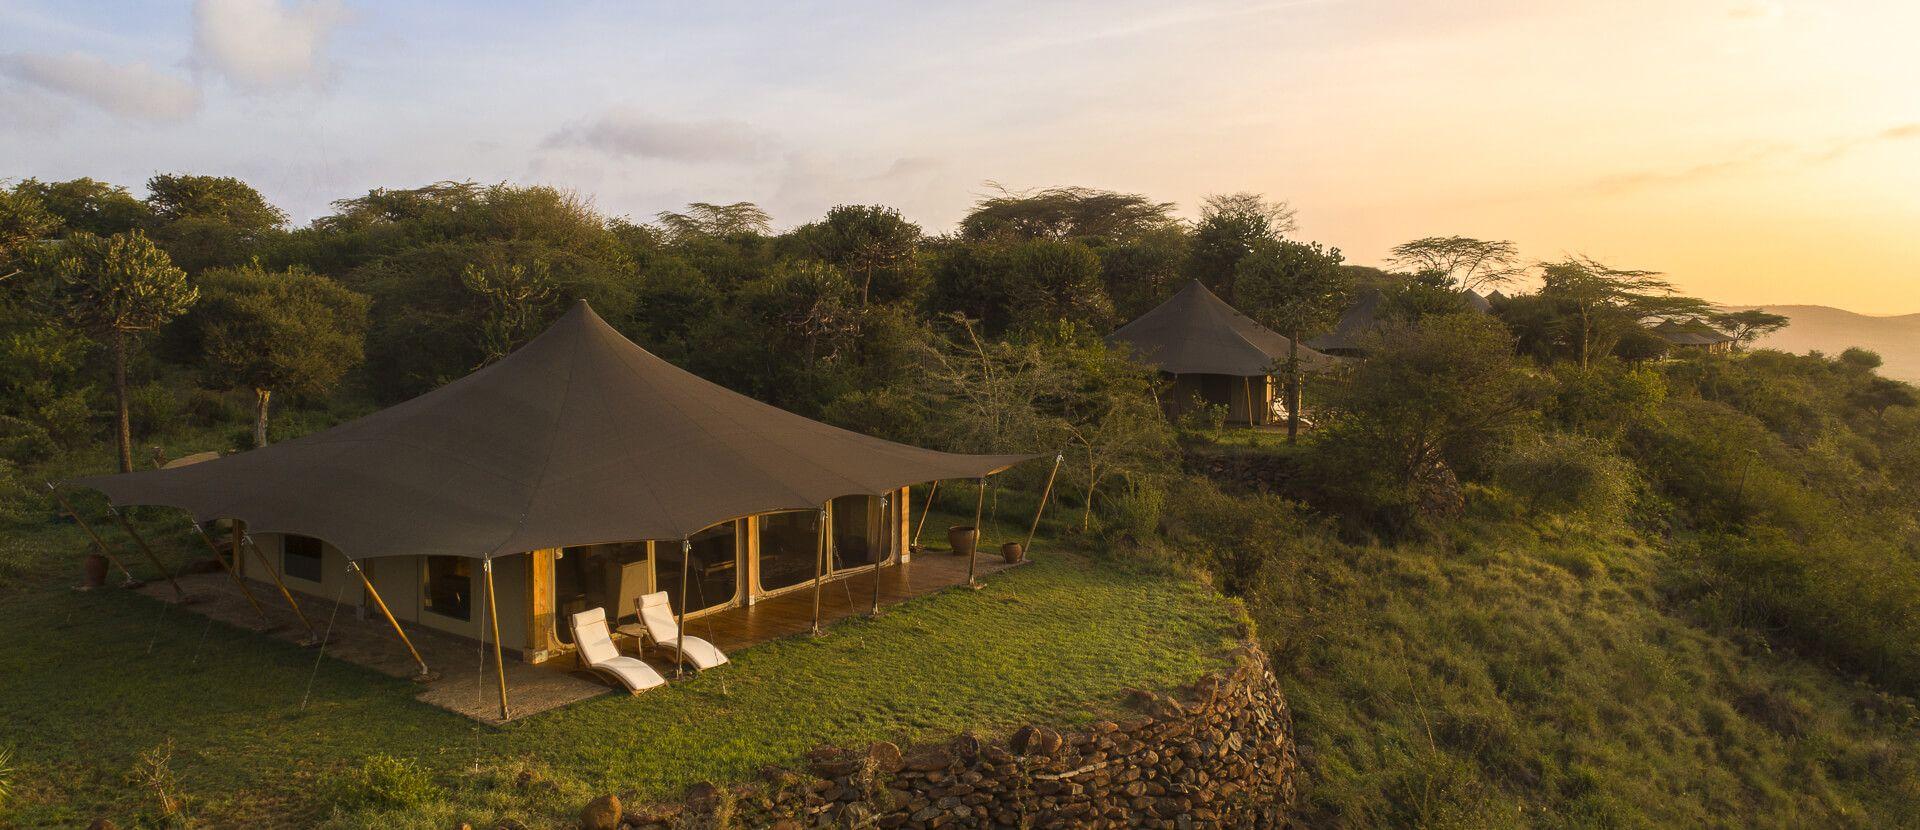 Loisaba Tented Camp by Elewana